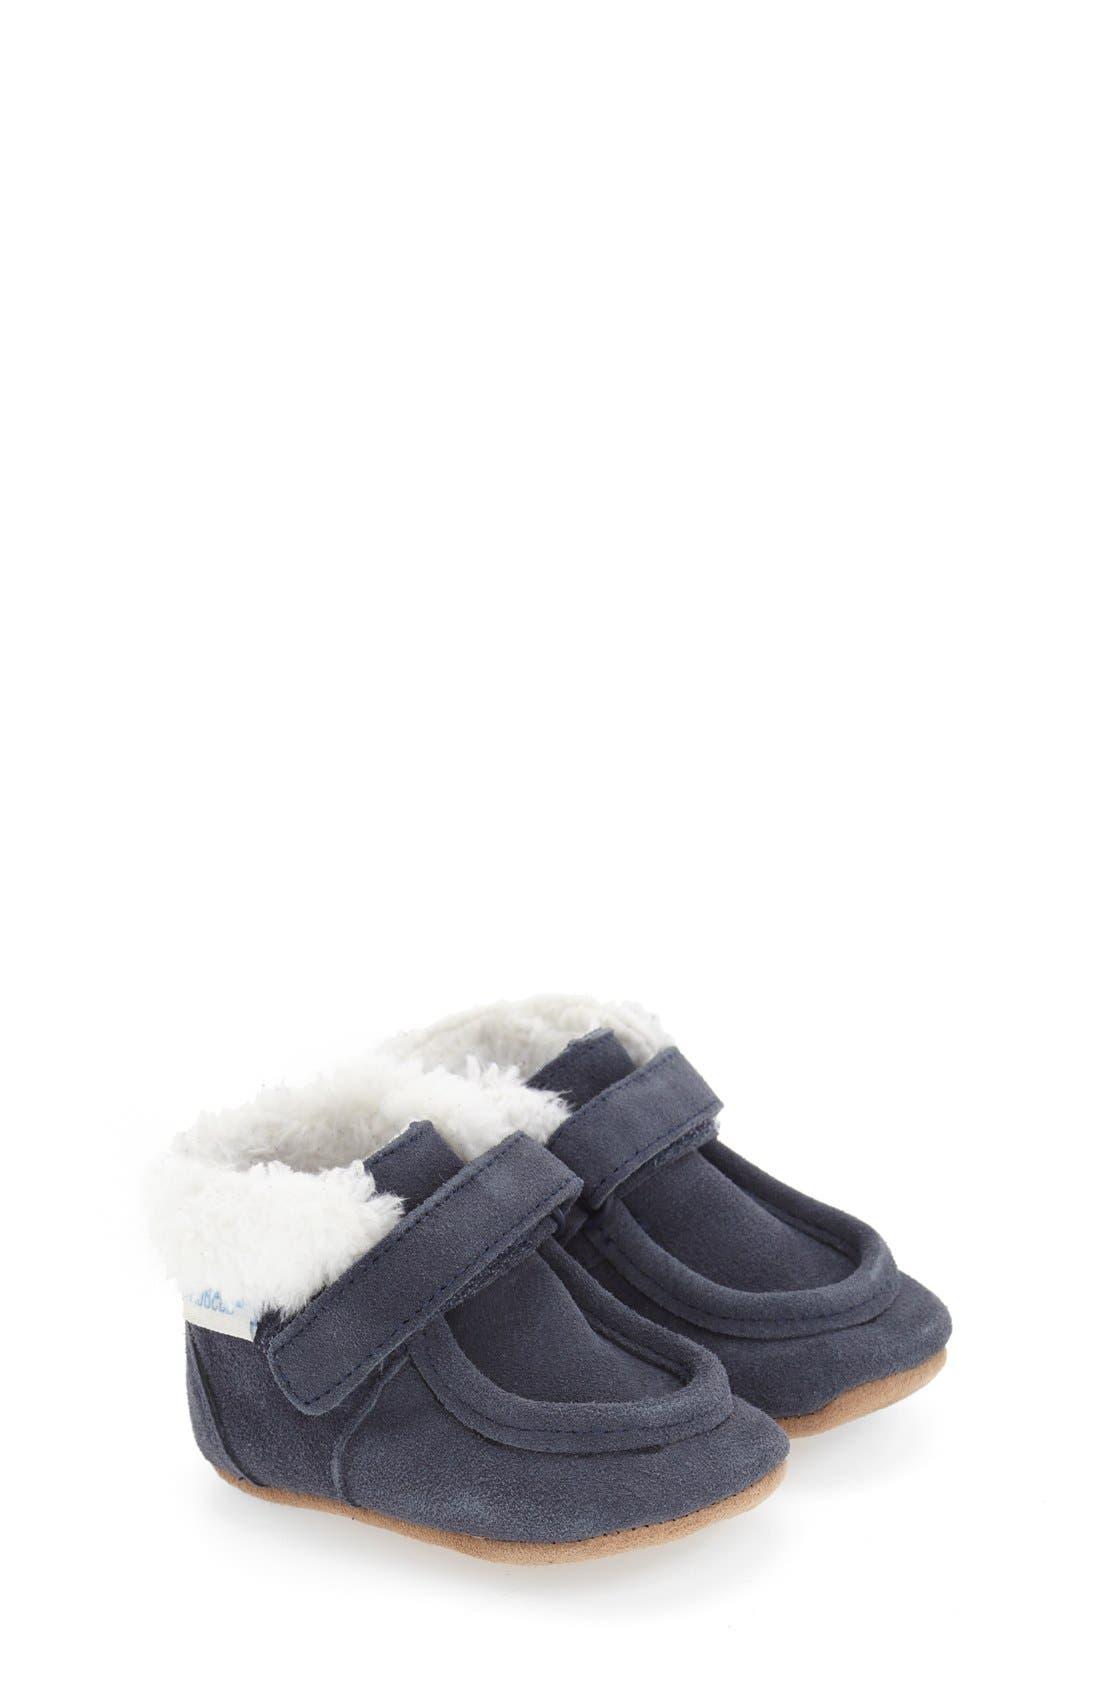 'Sawyer Snuggle' Crib Shoe,                             Main thumbnail 1, color,                             410